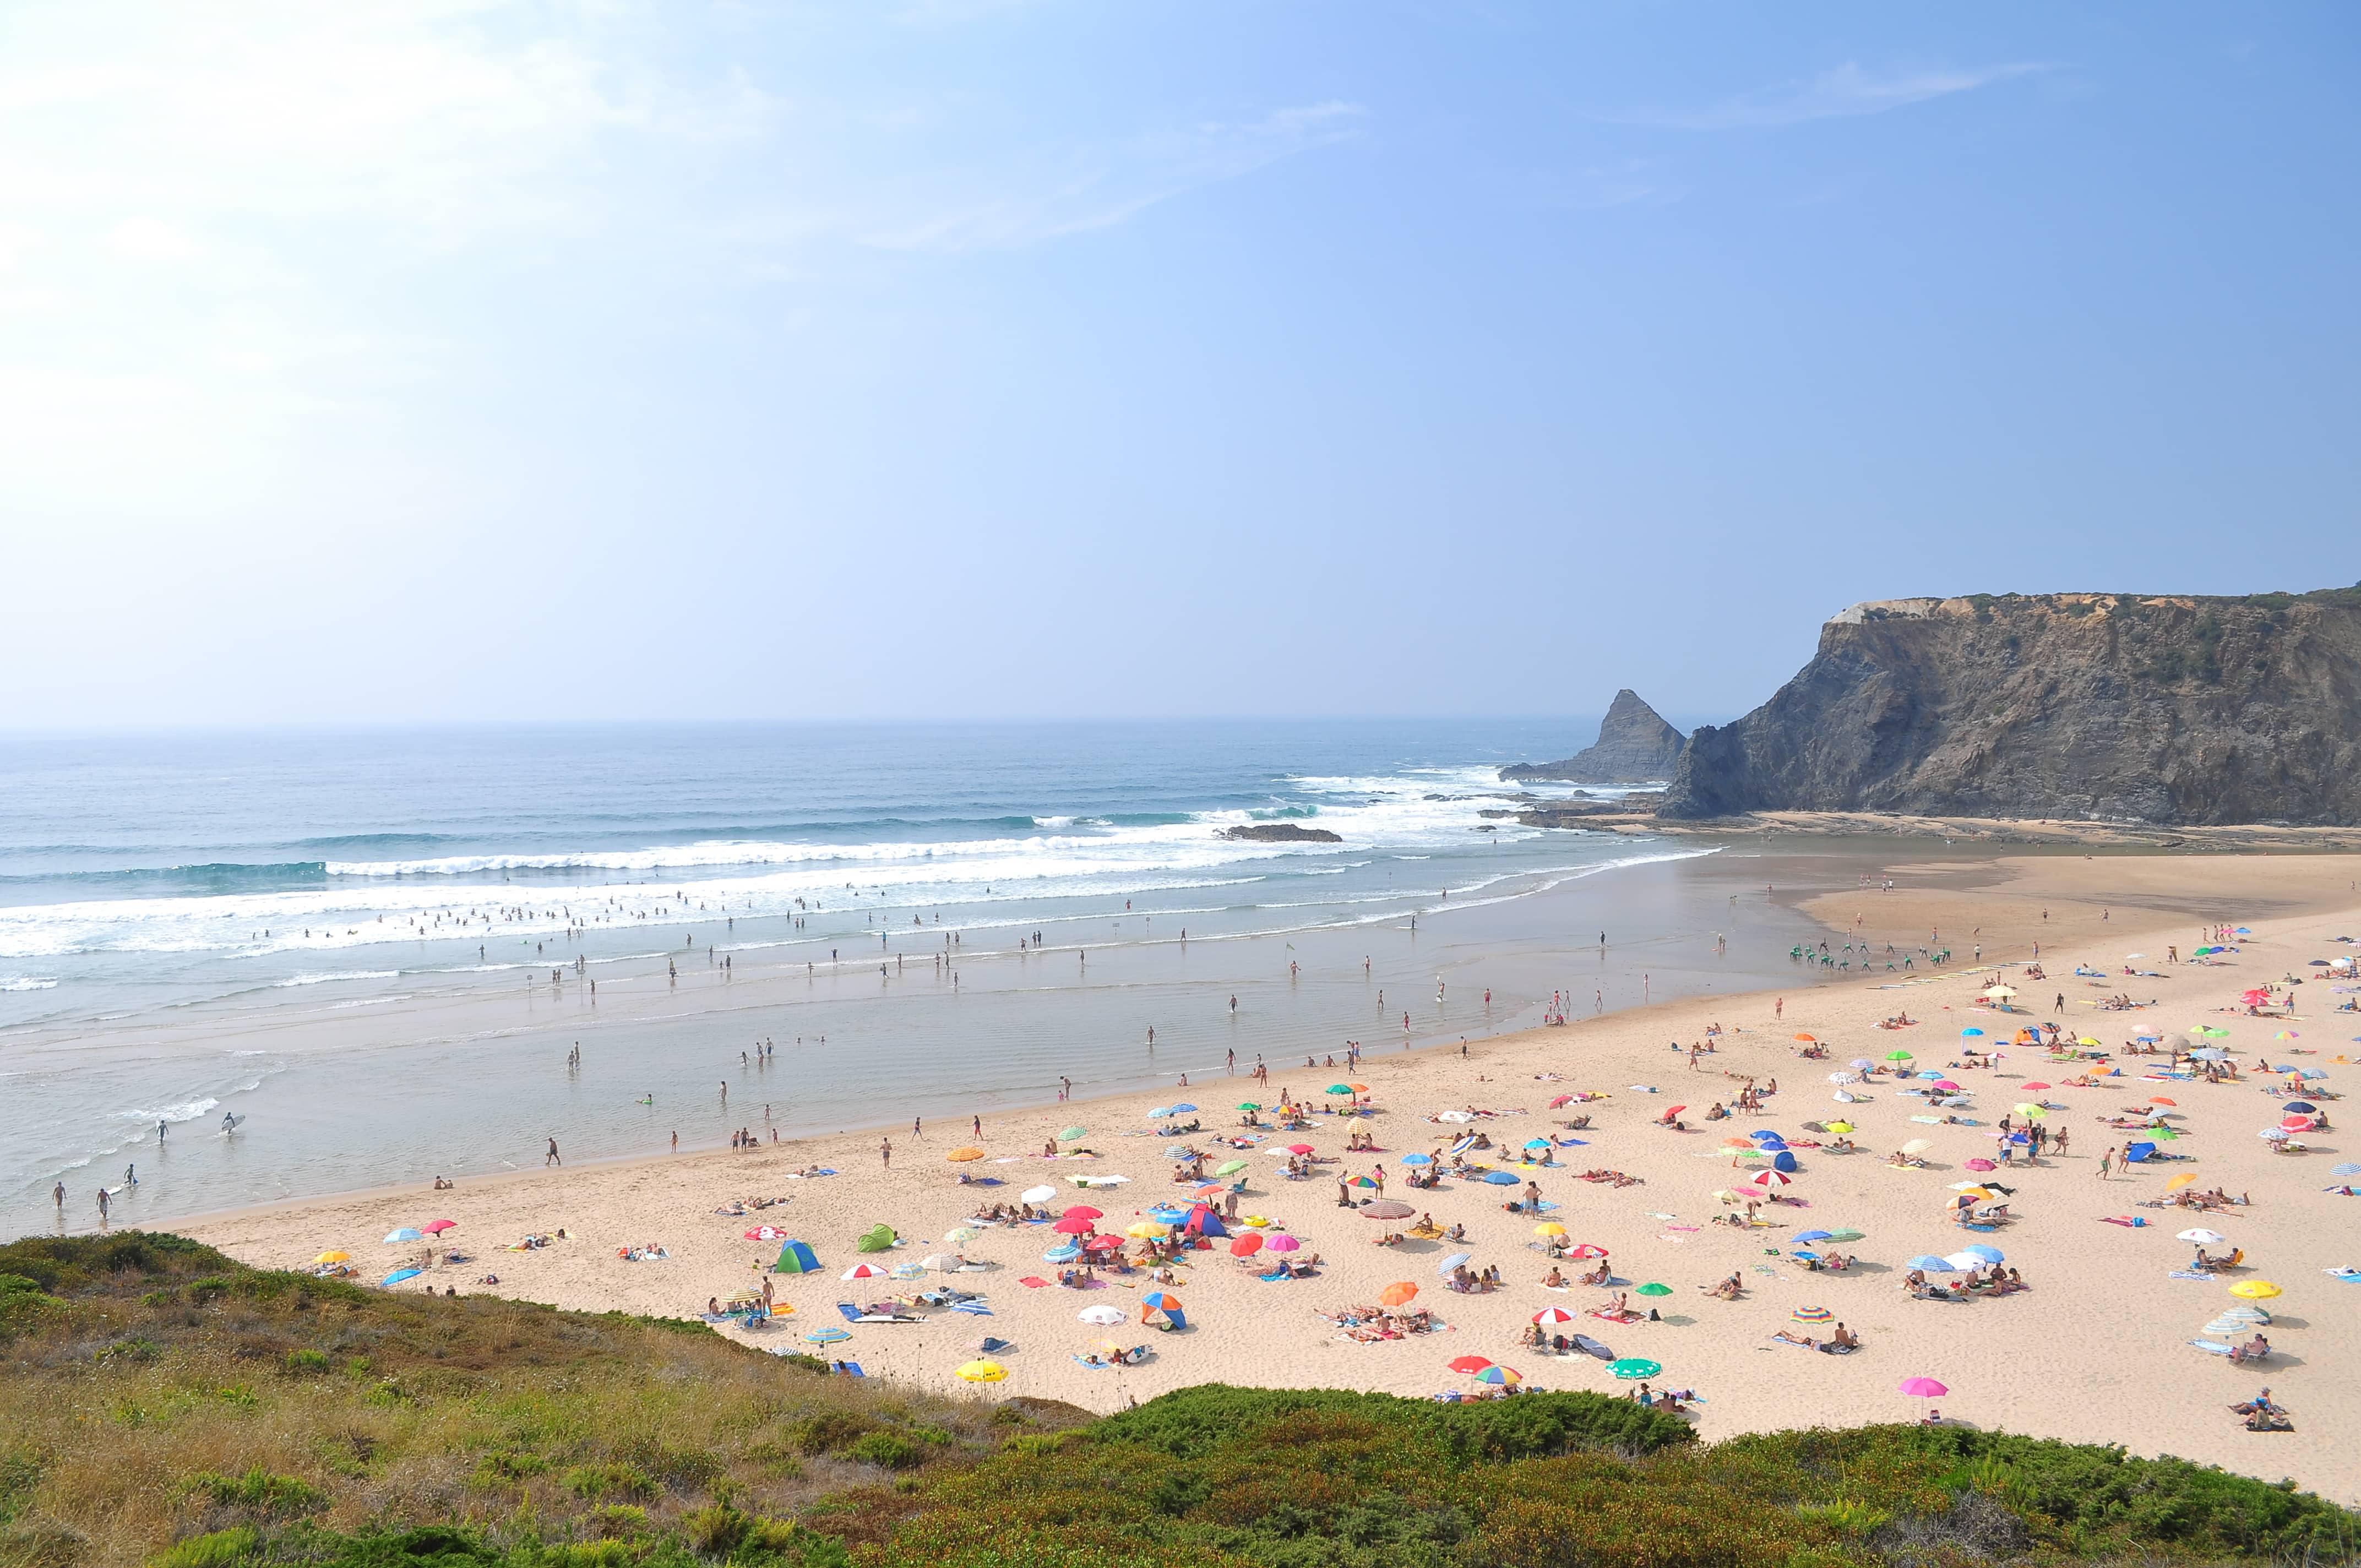 Beaches in Algarve,  Praia de Odeceixe Mar